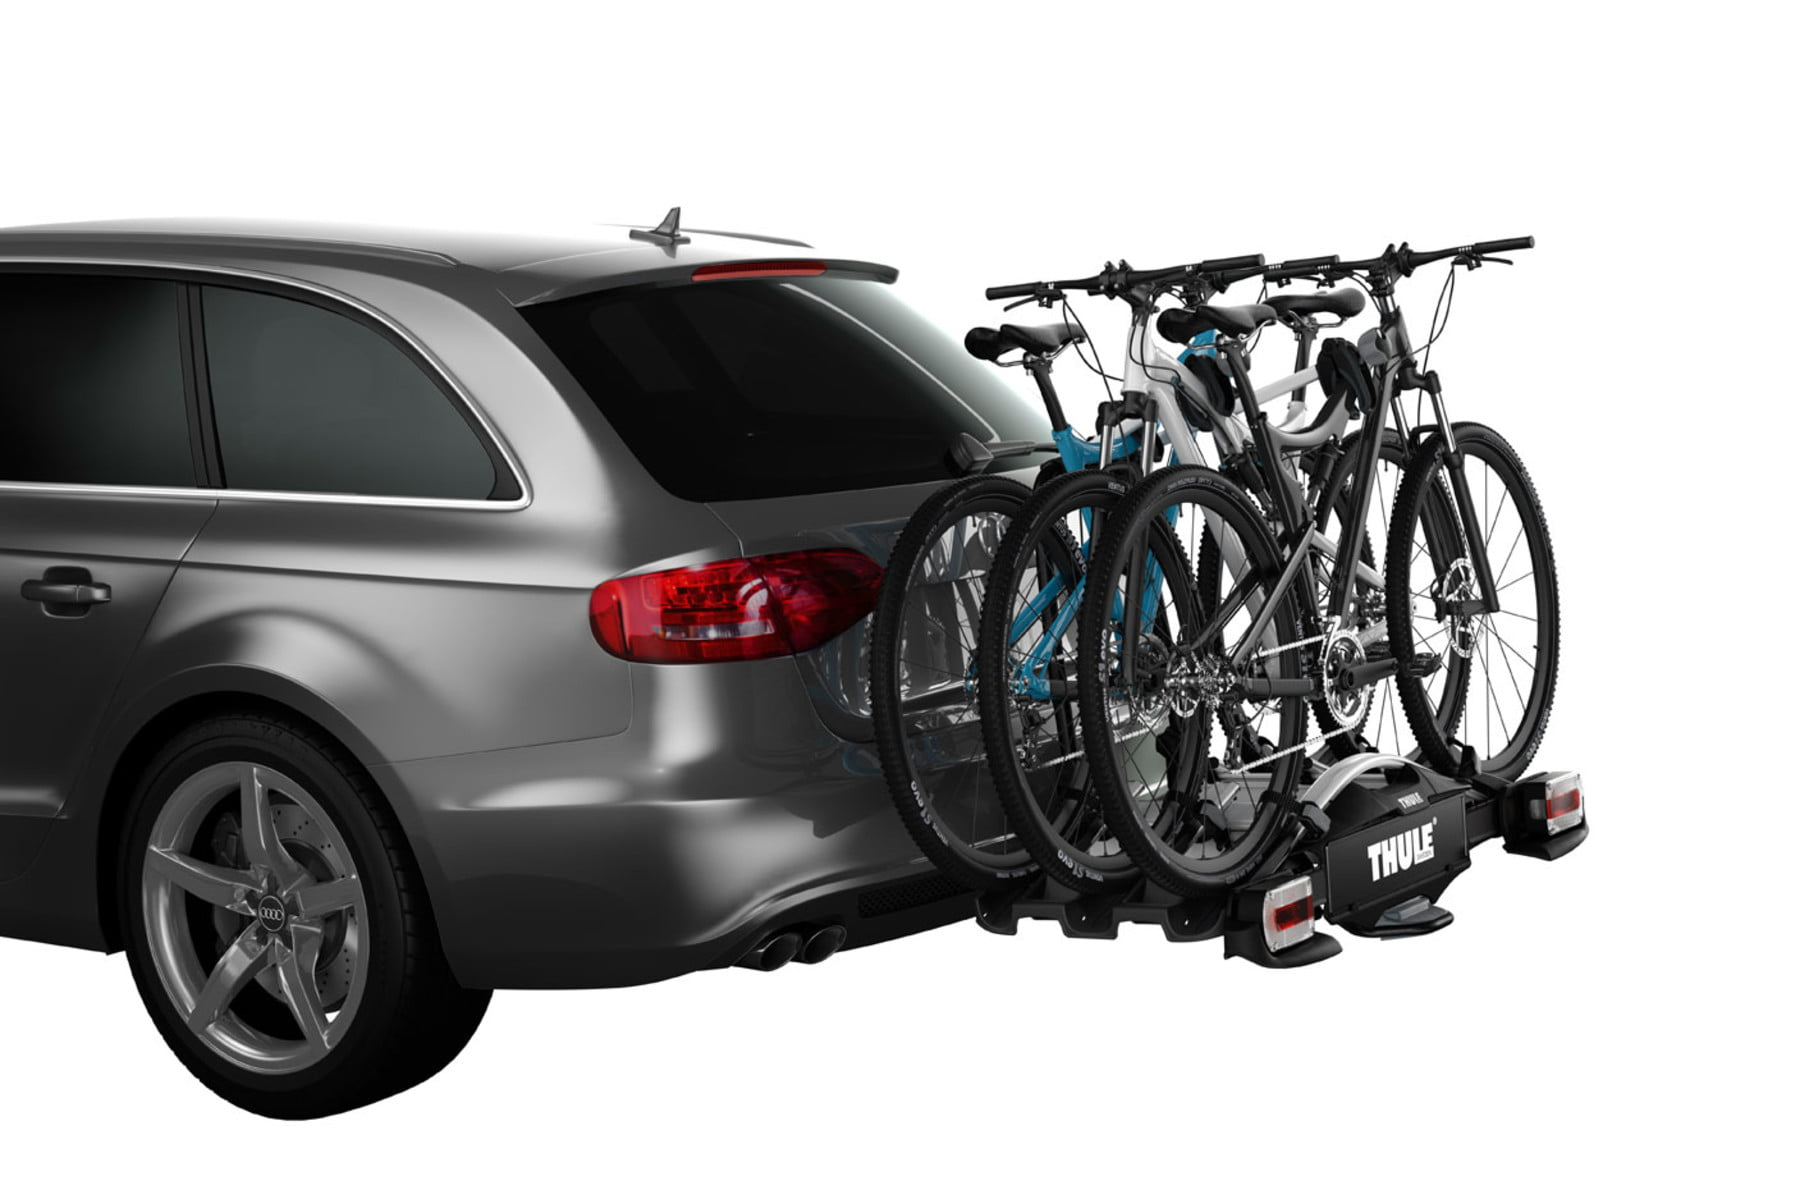 Suport biciclete Thule VeloCompact 927 cu prindere pe carligul de remorcare 2